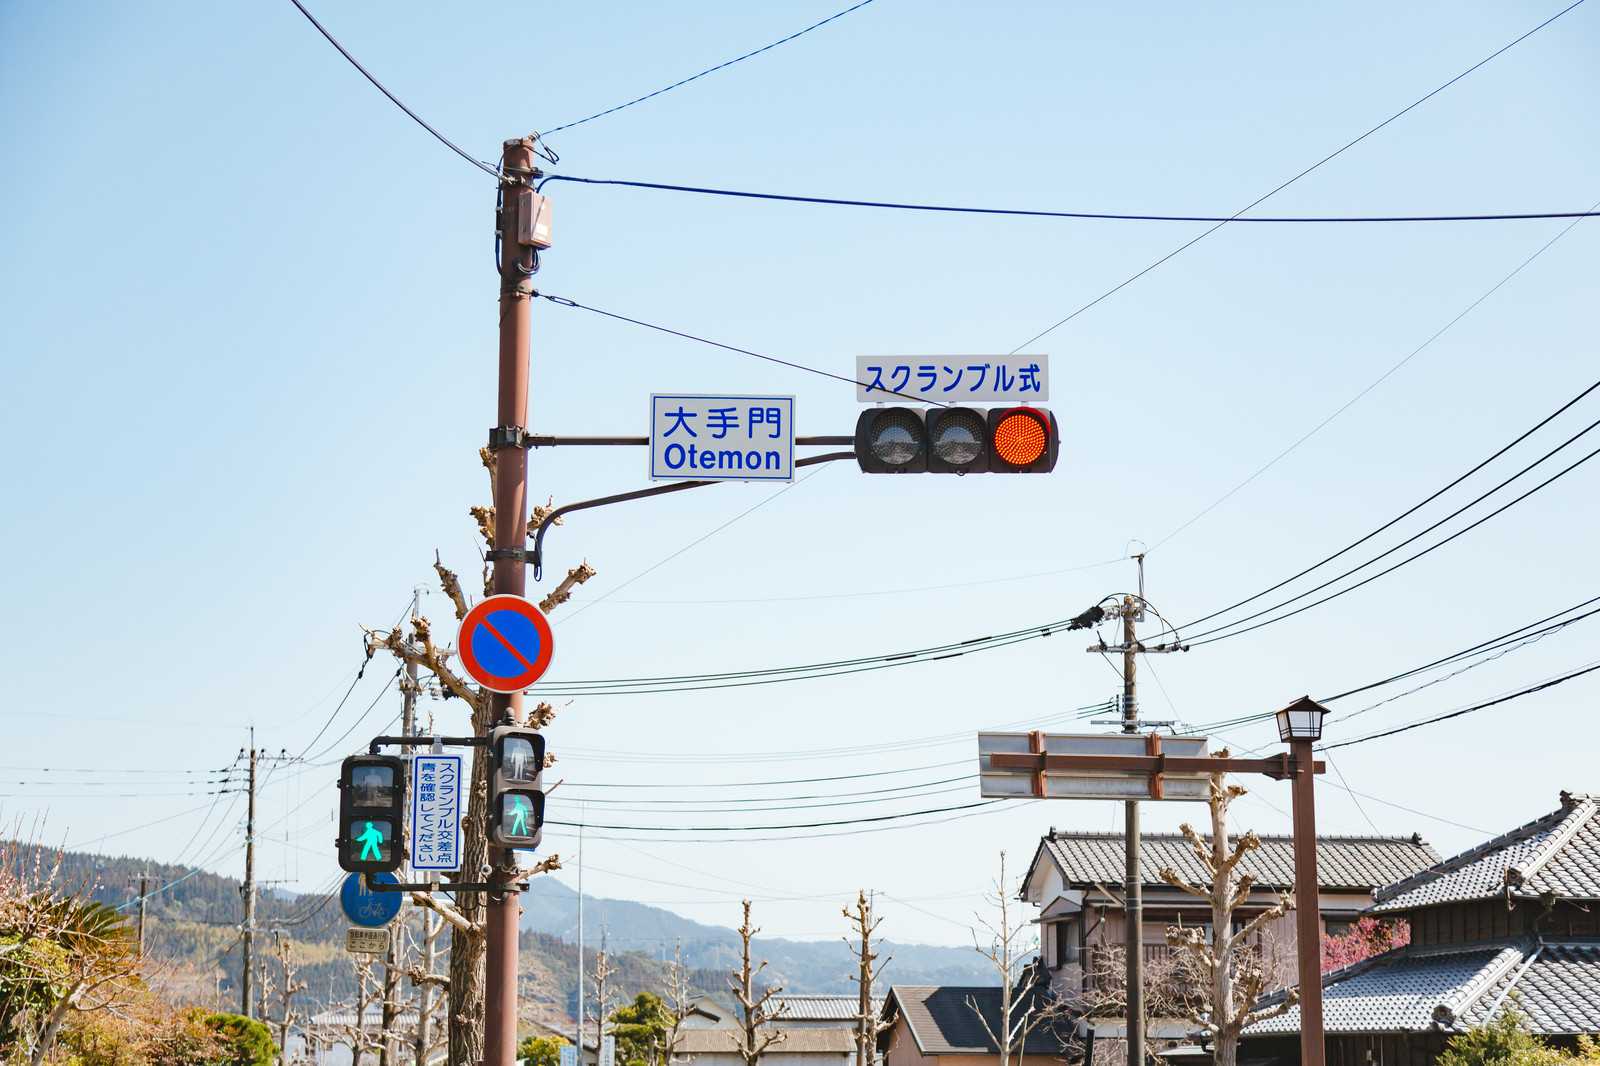 Nichinan0I9A3613 TP V traffic lights